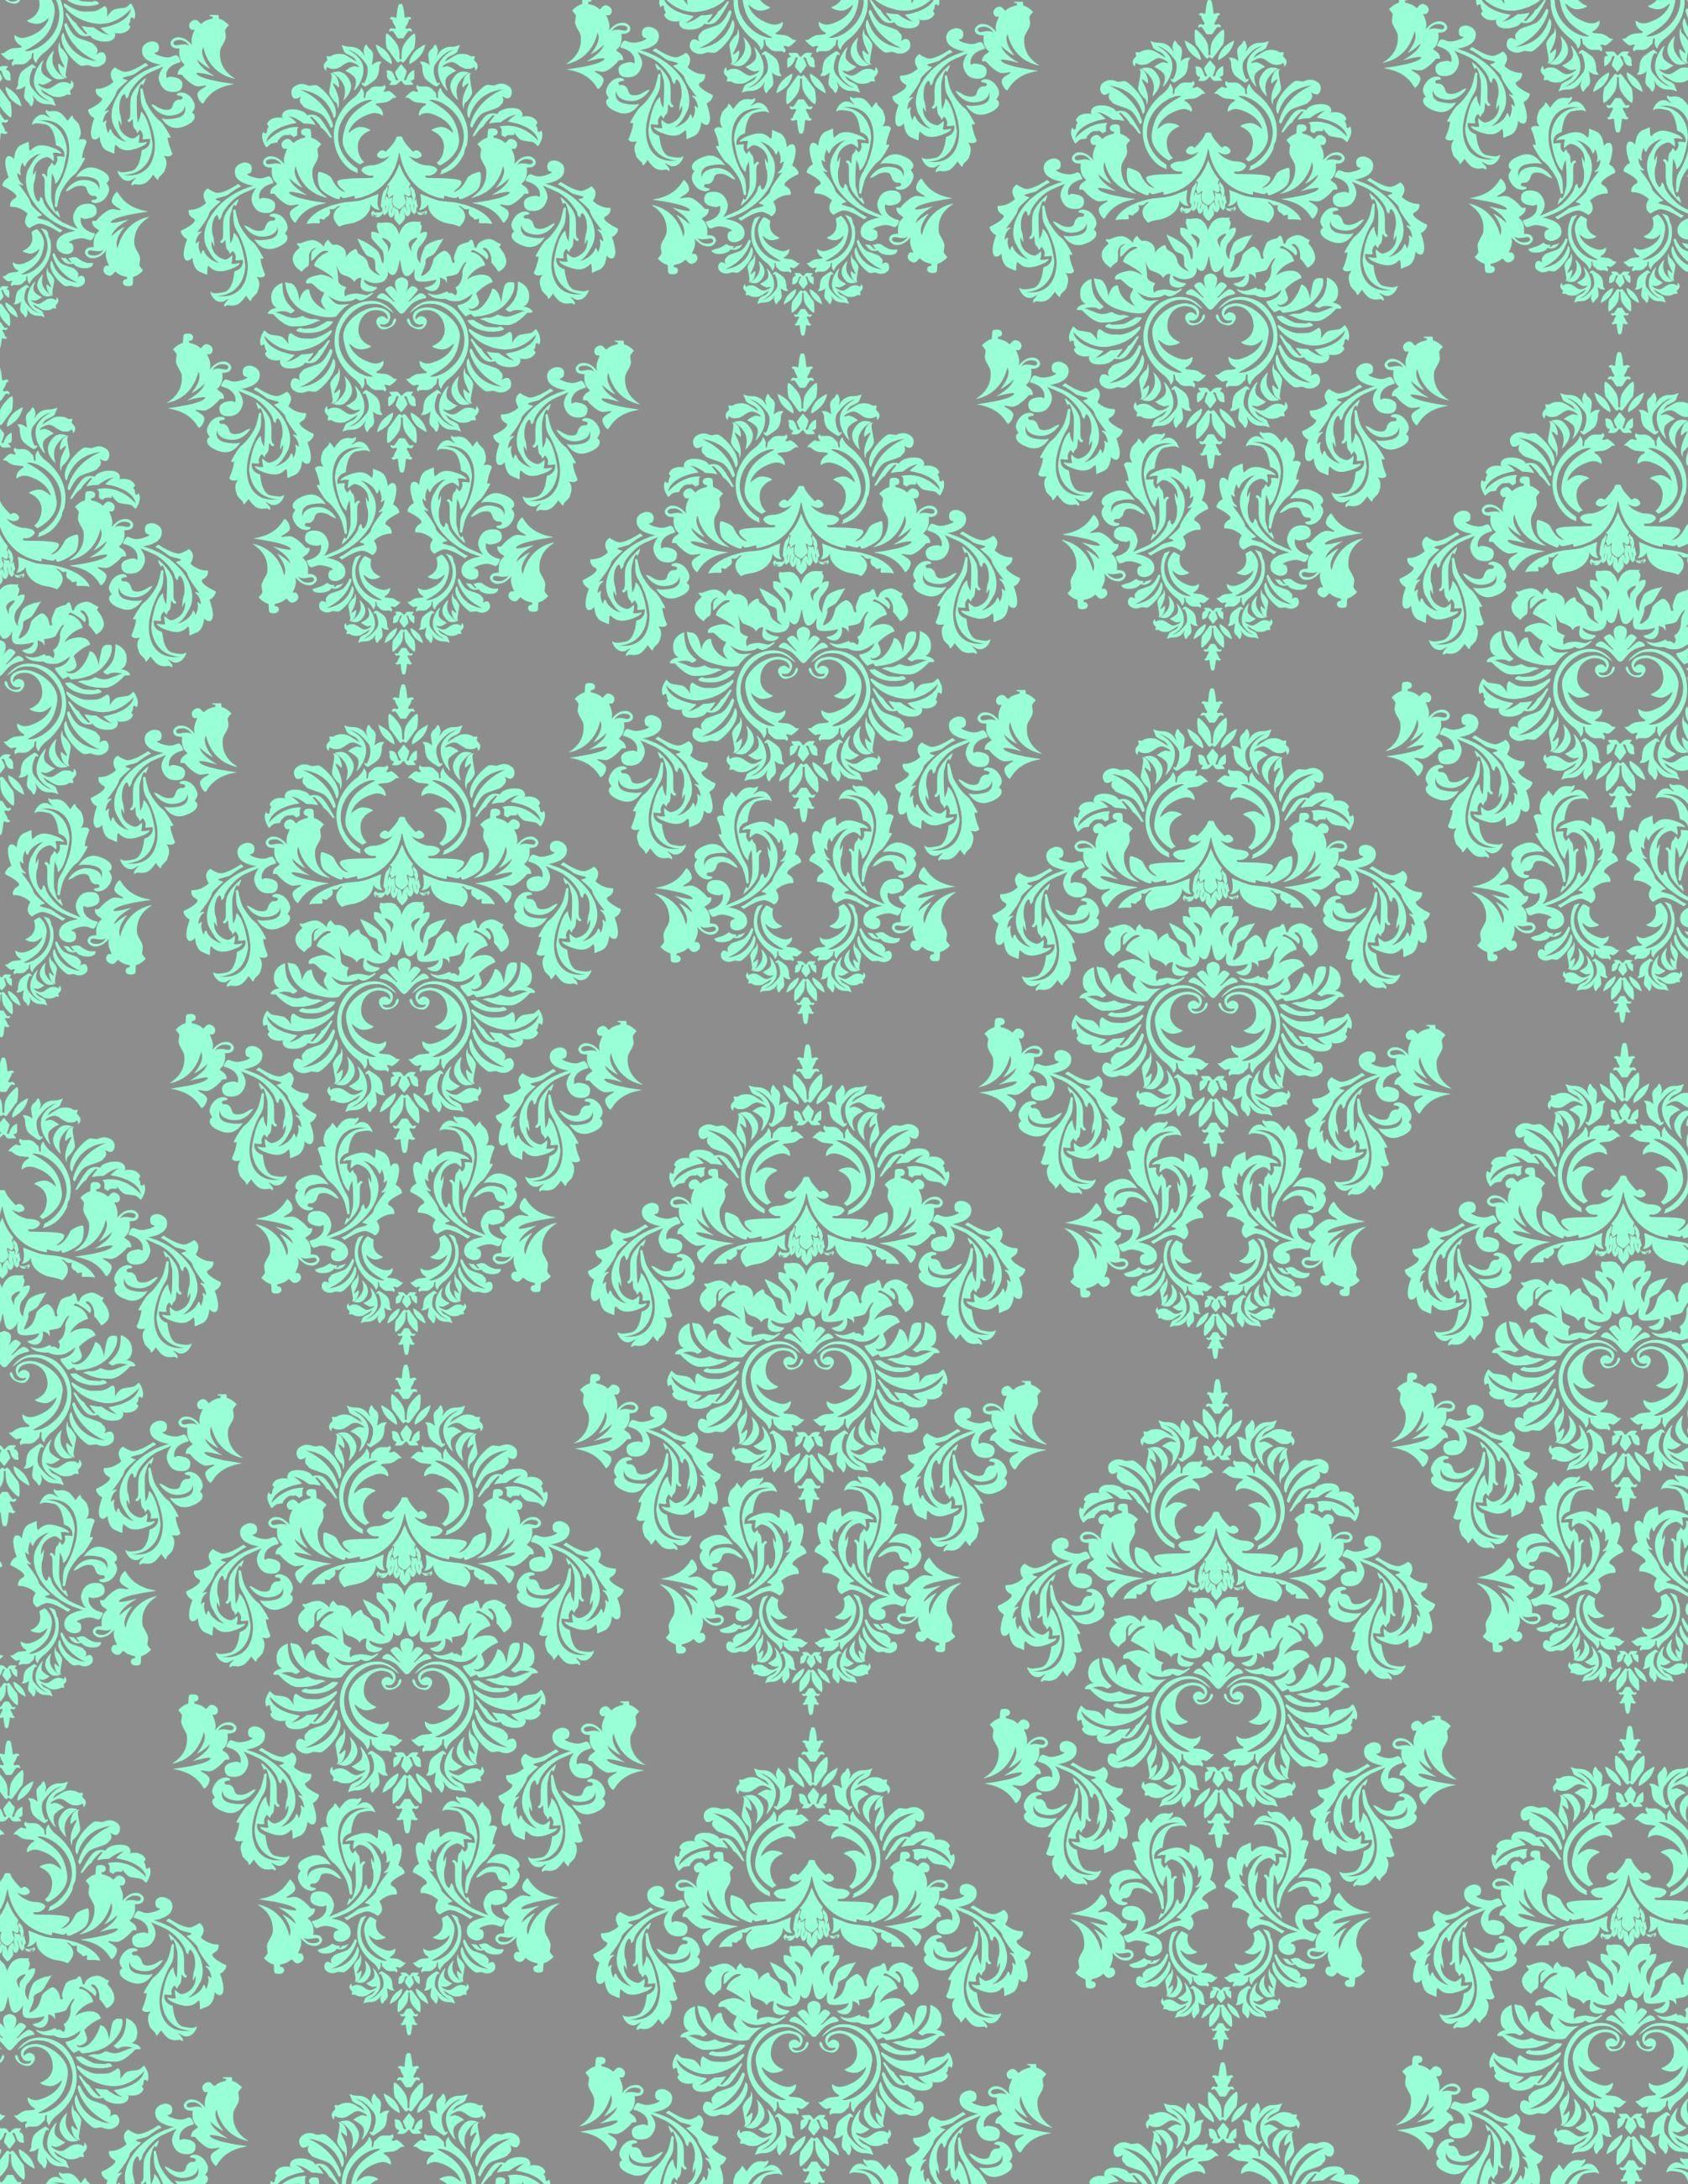 Aqua Damask Looks Great On Gray Background Mint Green Wallpaper